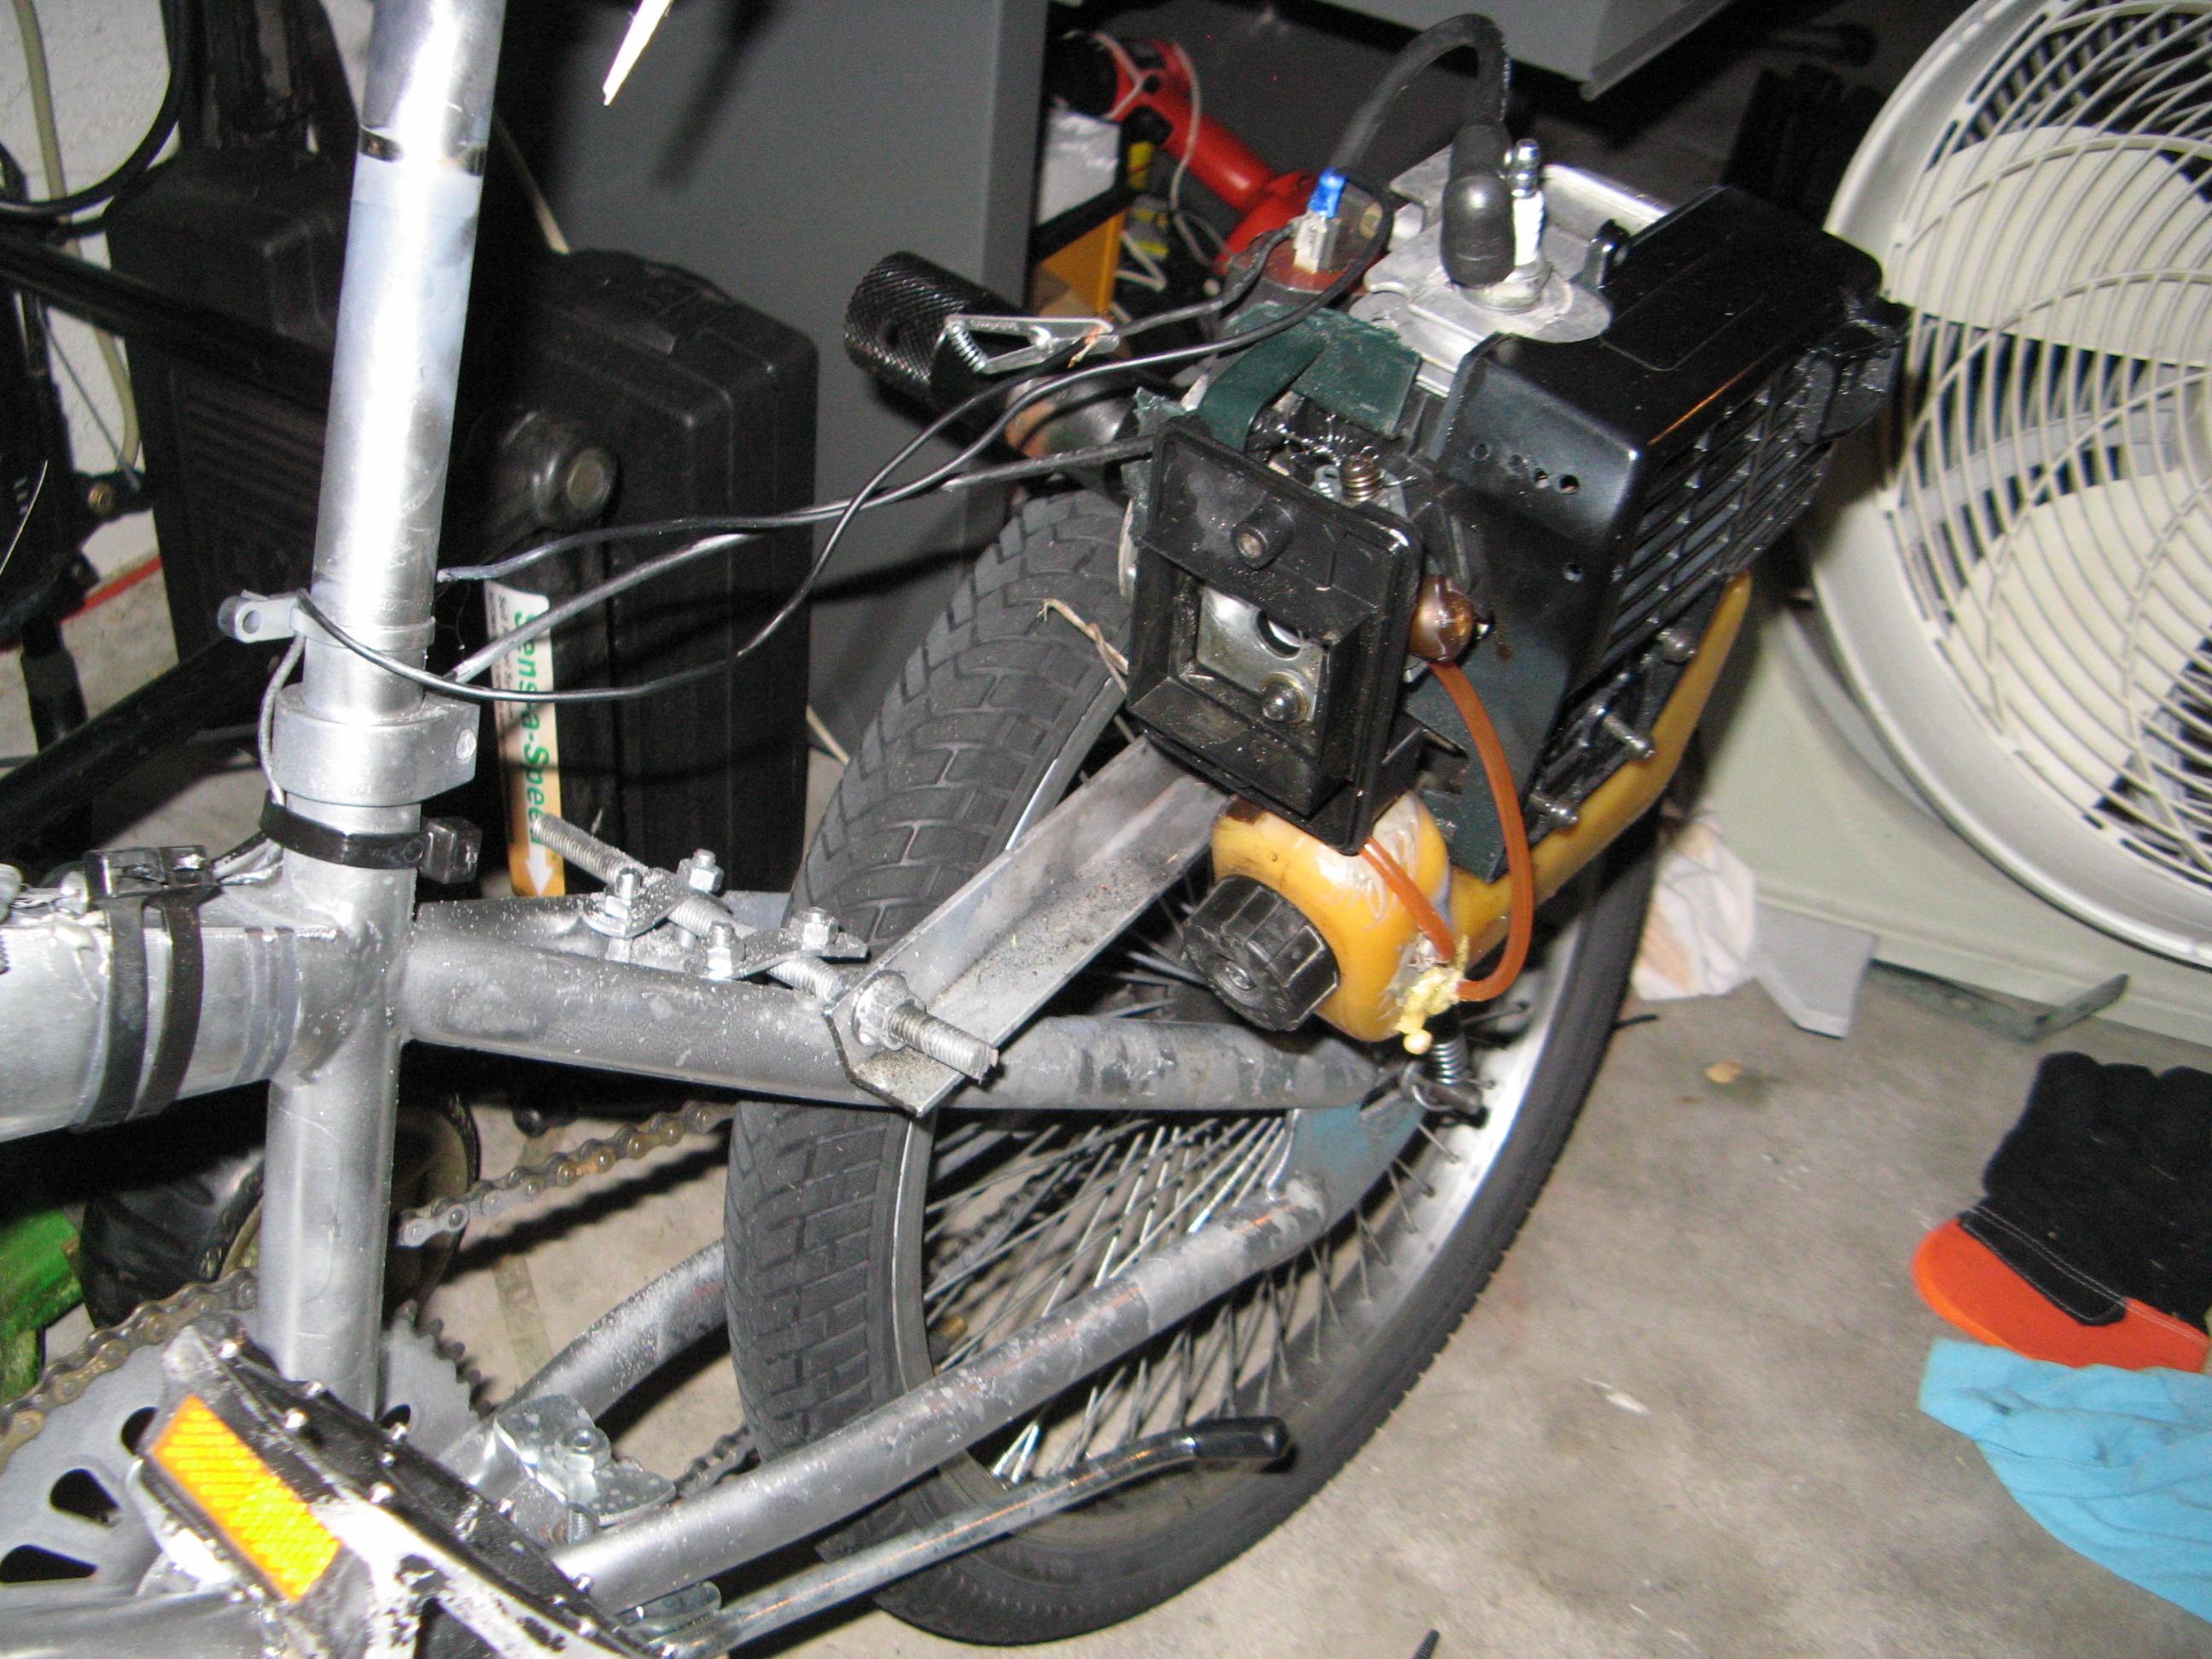 hight resolution of 45cc pocket bike wiring diagram razor wiring library scooter cdi wiring diagram 45cc pocket bike wiring